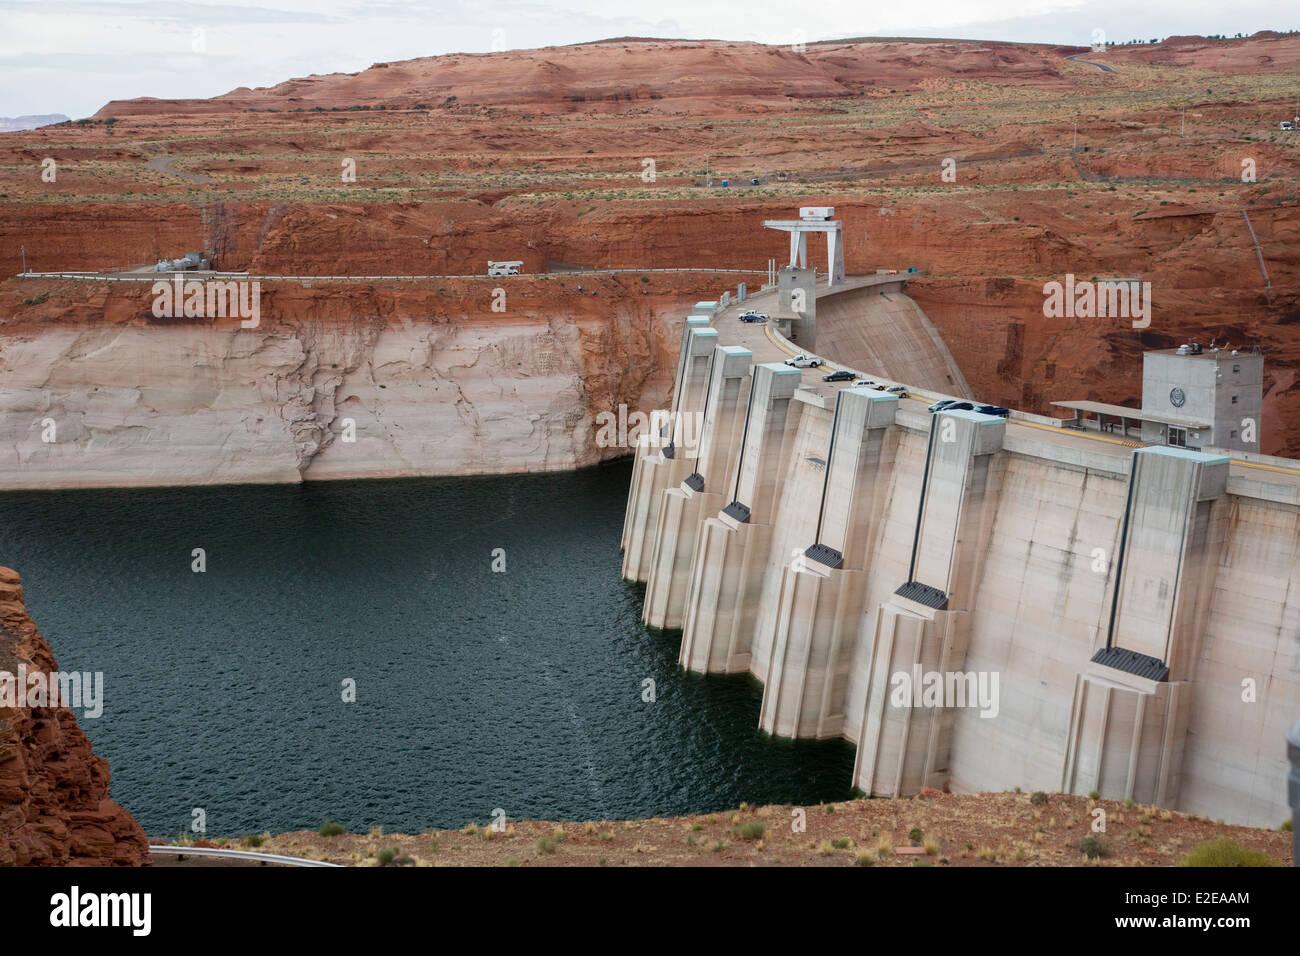 """Badewanne Ring"" am Lake Powell am Glen Canyon Dam zeigt Auswirkungen der Dürre Stockbild"